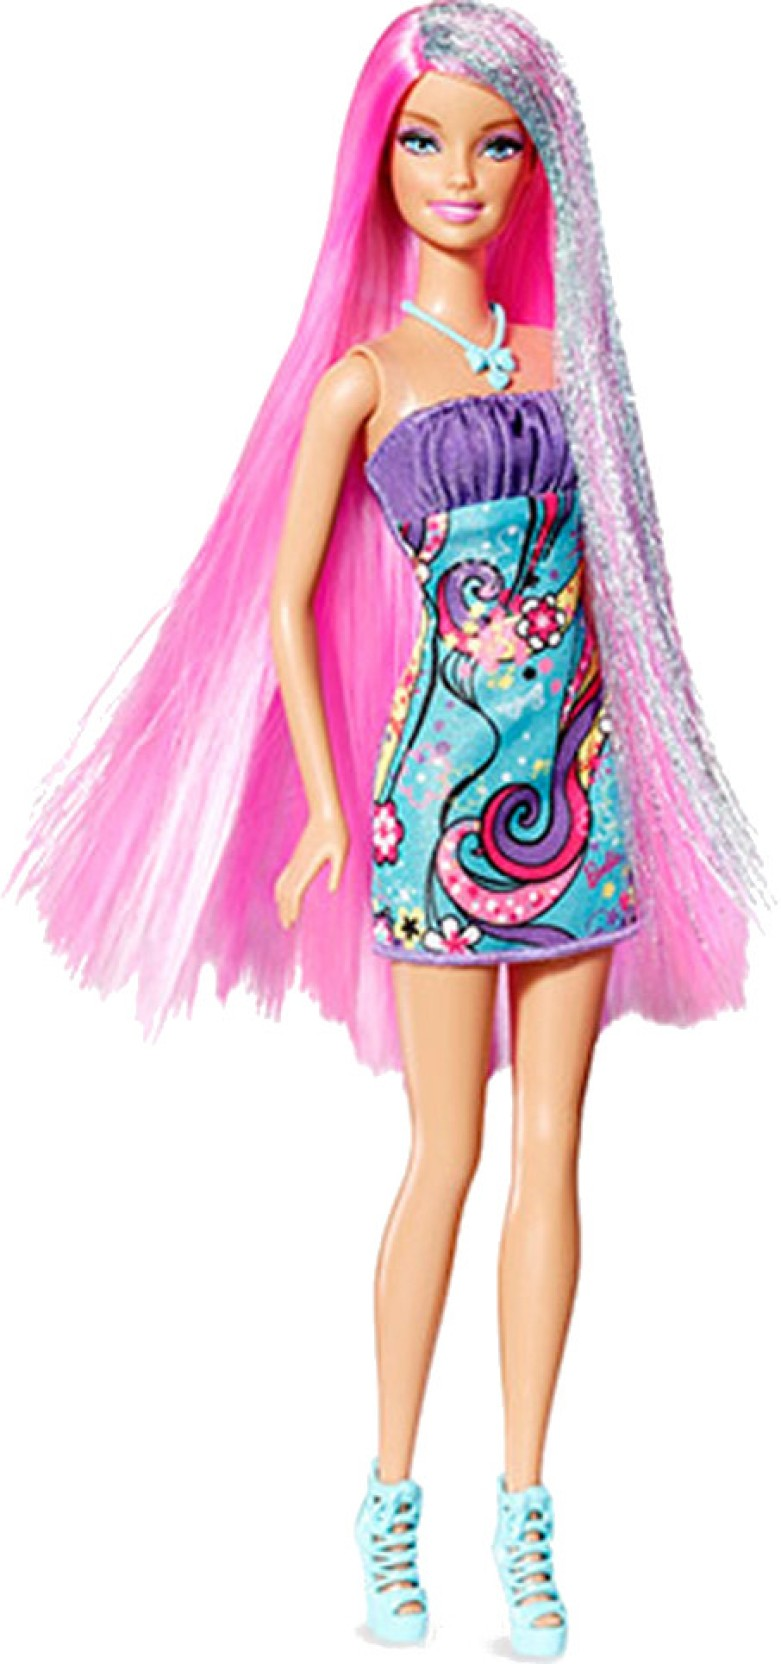 Barbie Long Hair Doll Pink Hair Long Hair Doll Pink